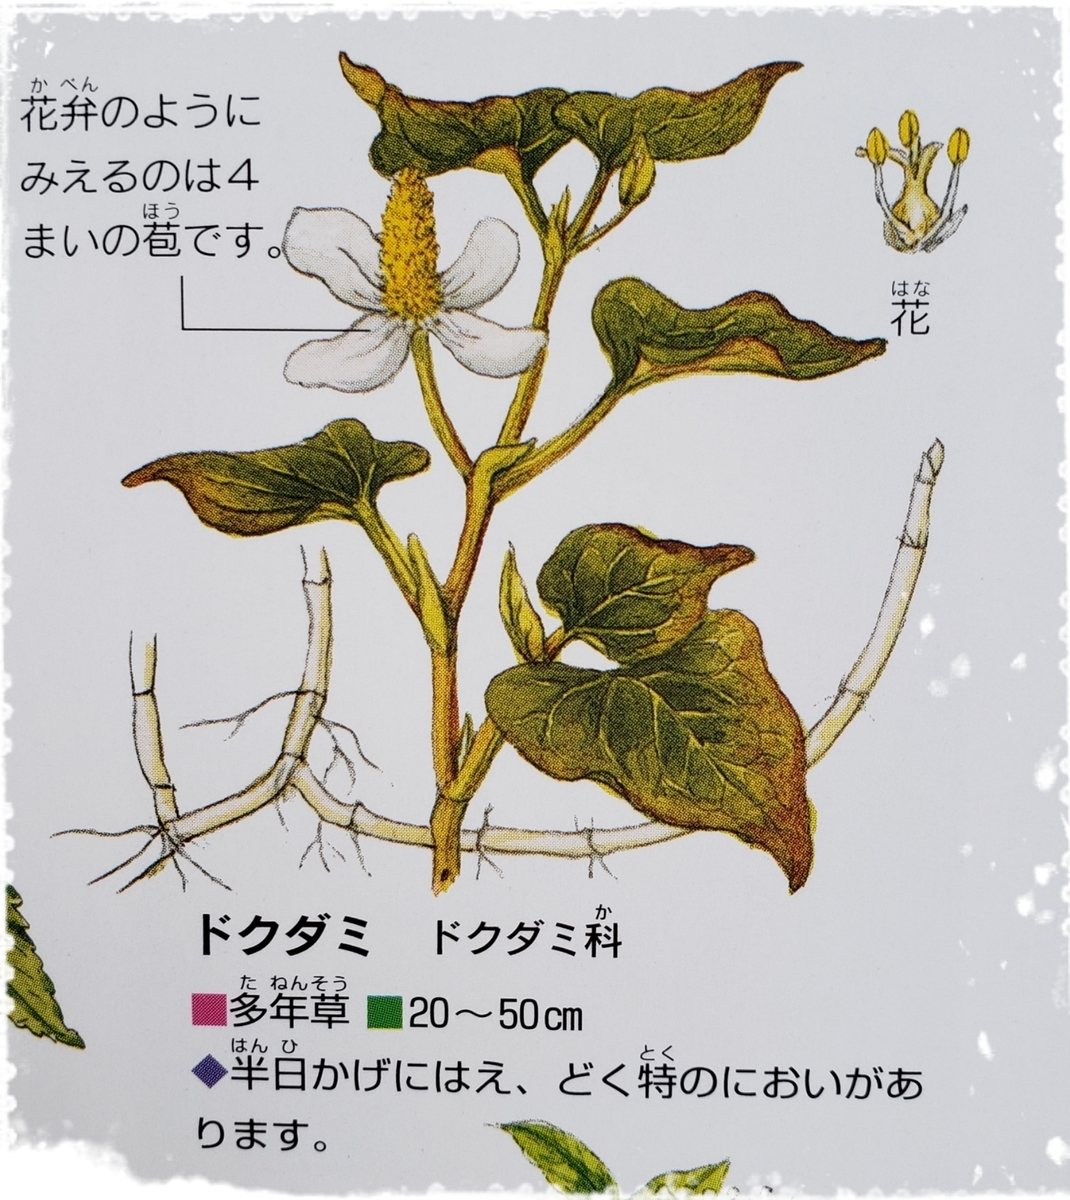 f:id:uchinomikan:20190418173048j:plain